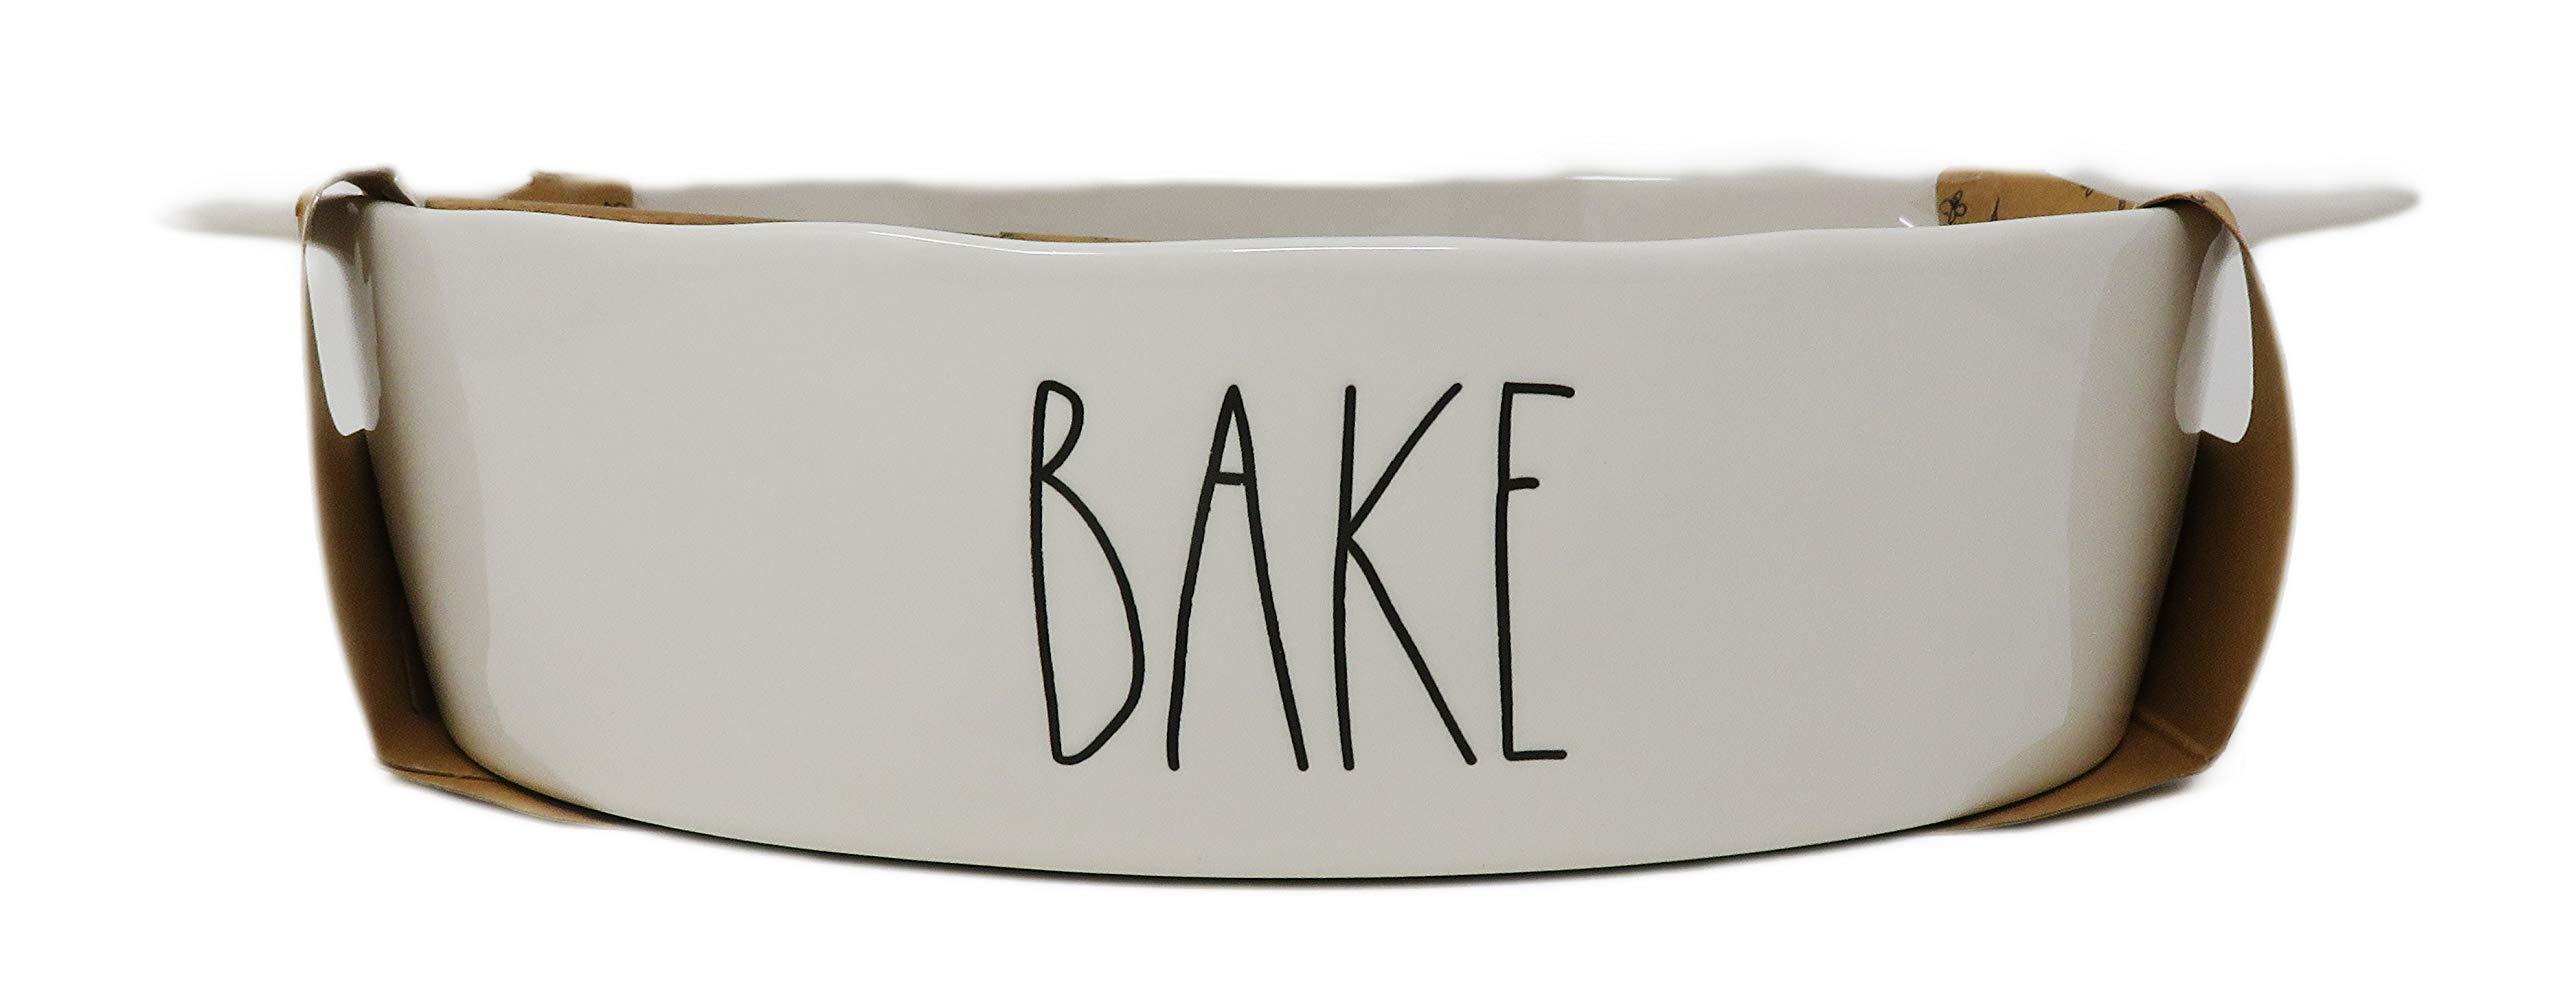 Rae Dunn By Magenta 2 Piece BAKE Ceramic LL Baking Dish & Wooden Spoon Set